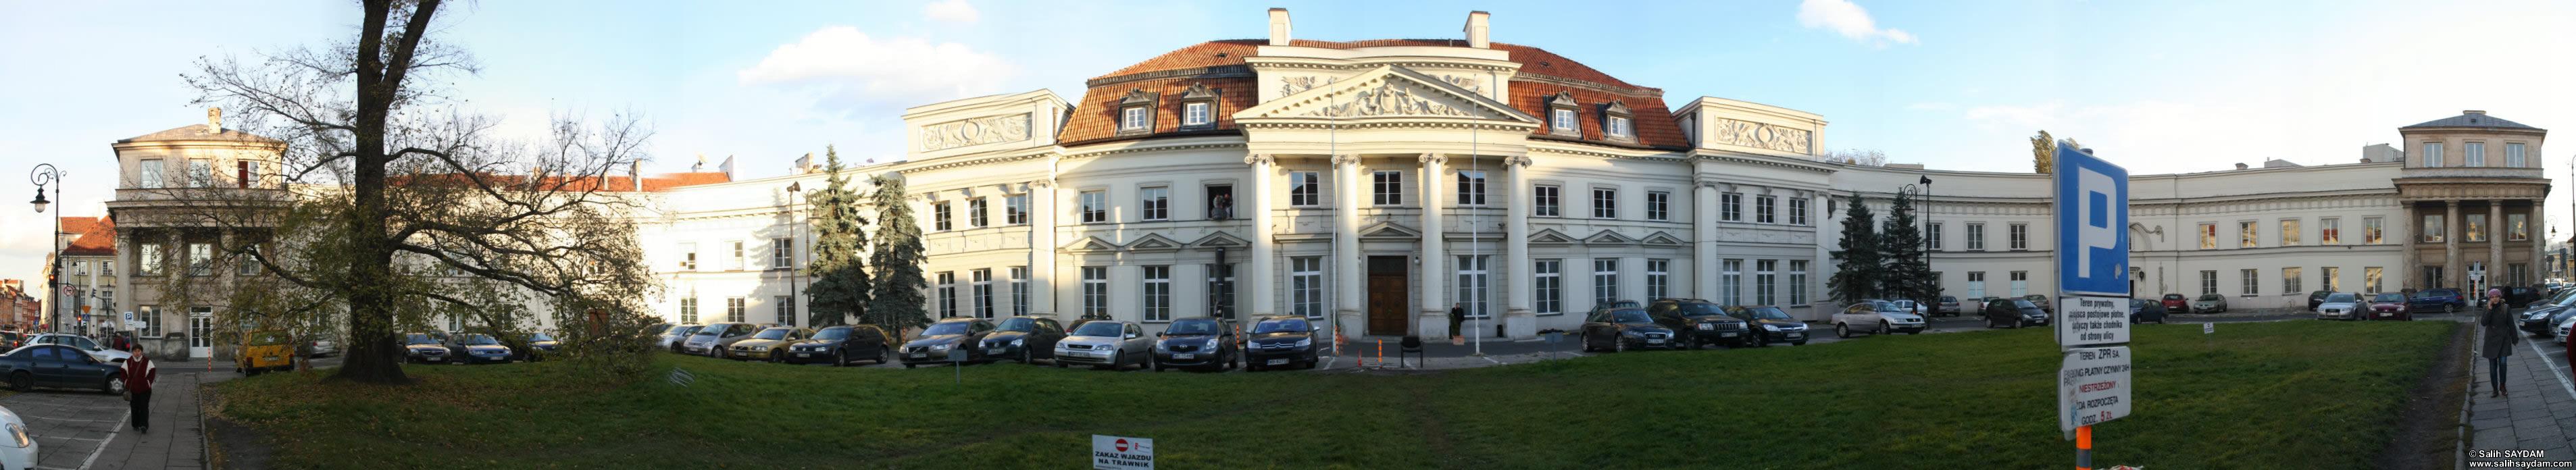 Majestic panorama at hofburg palace